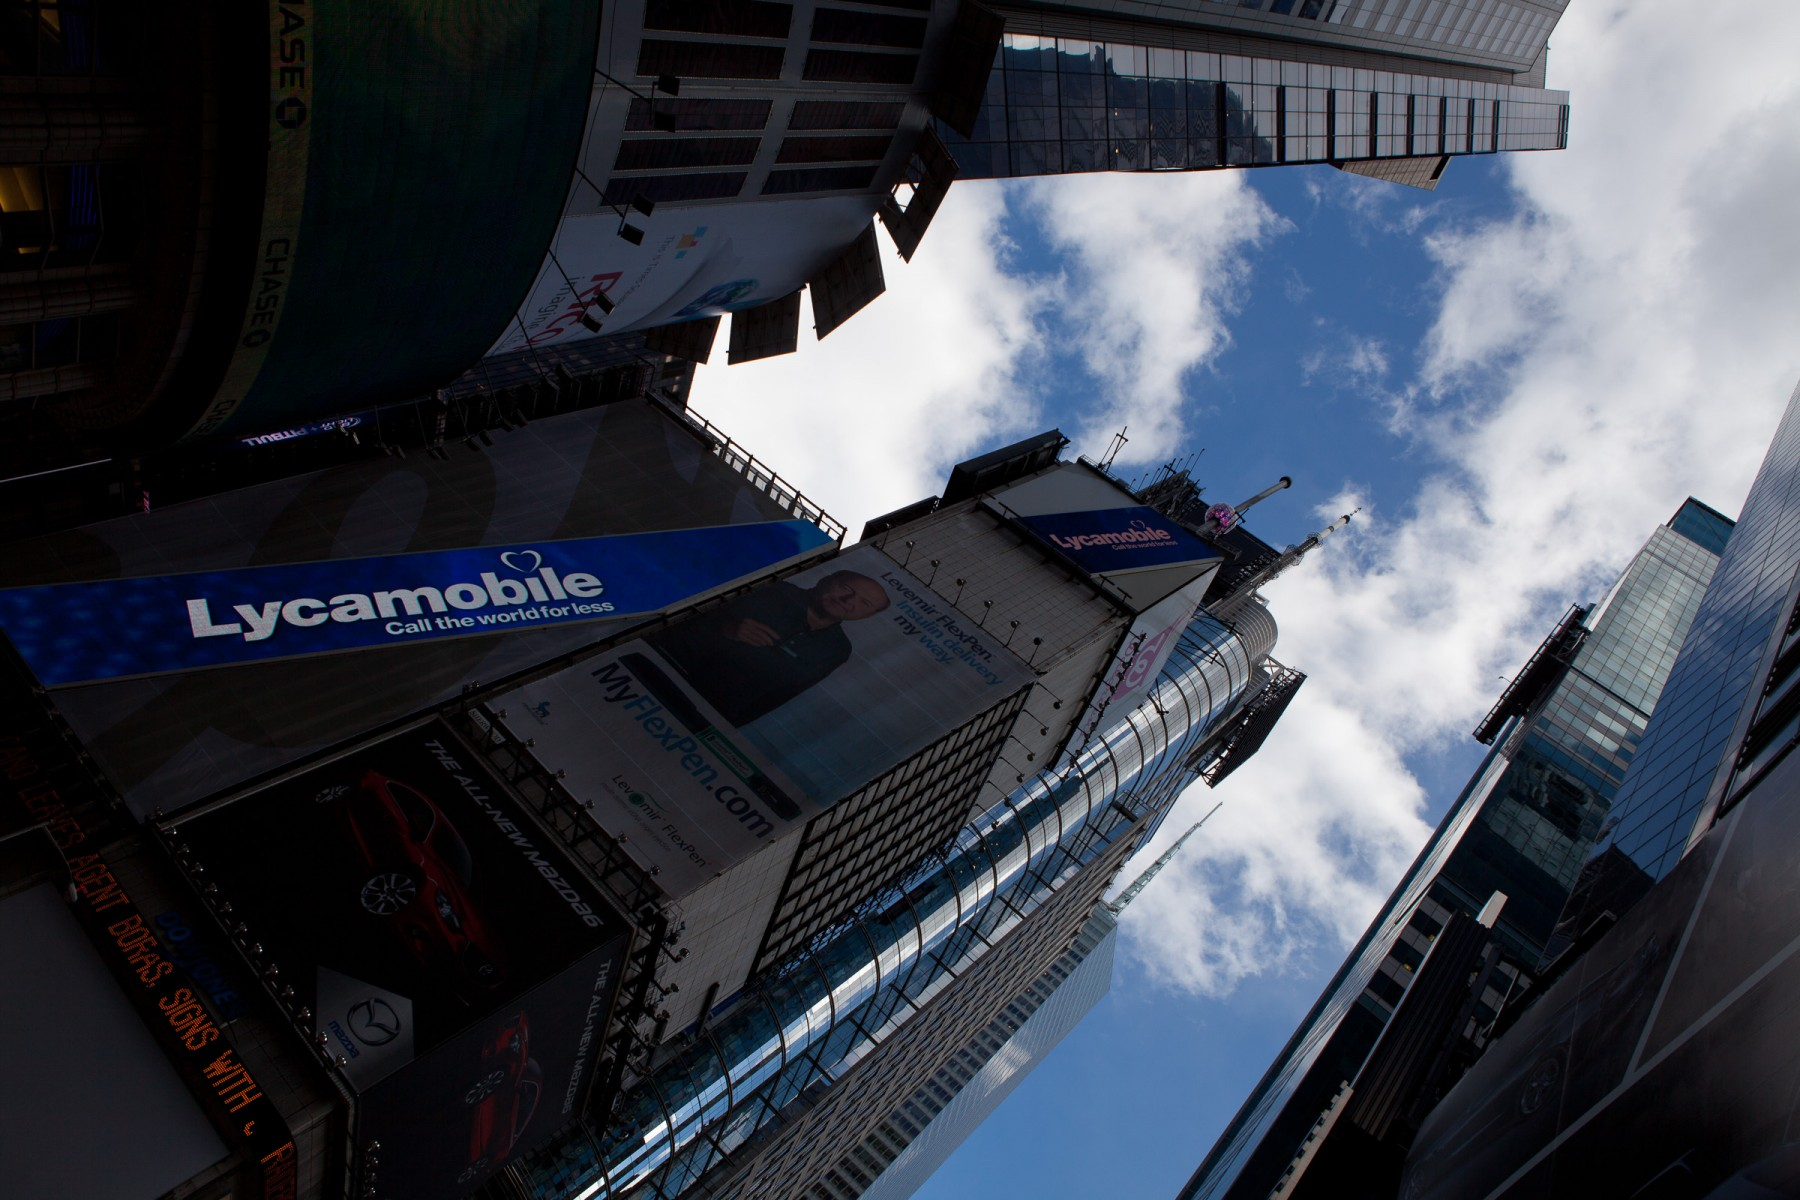 Skyscrapers in New York city.